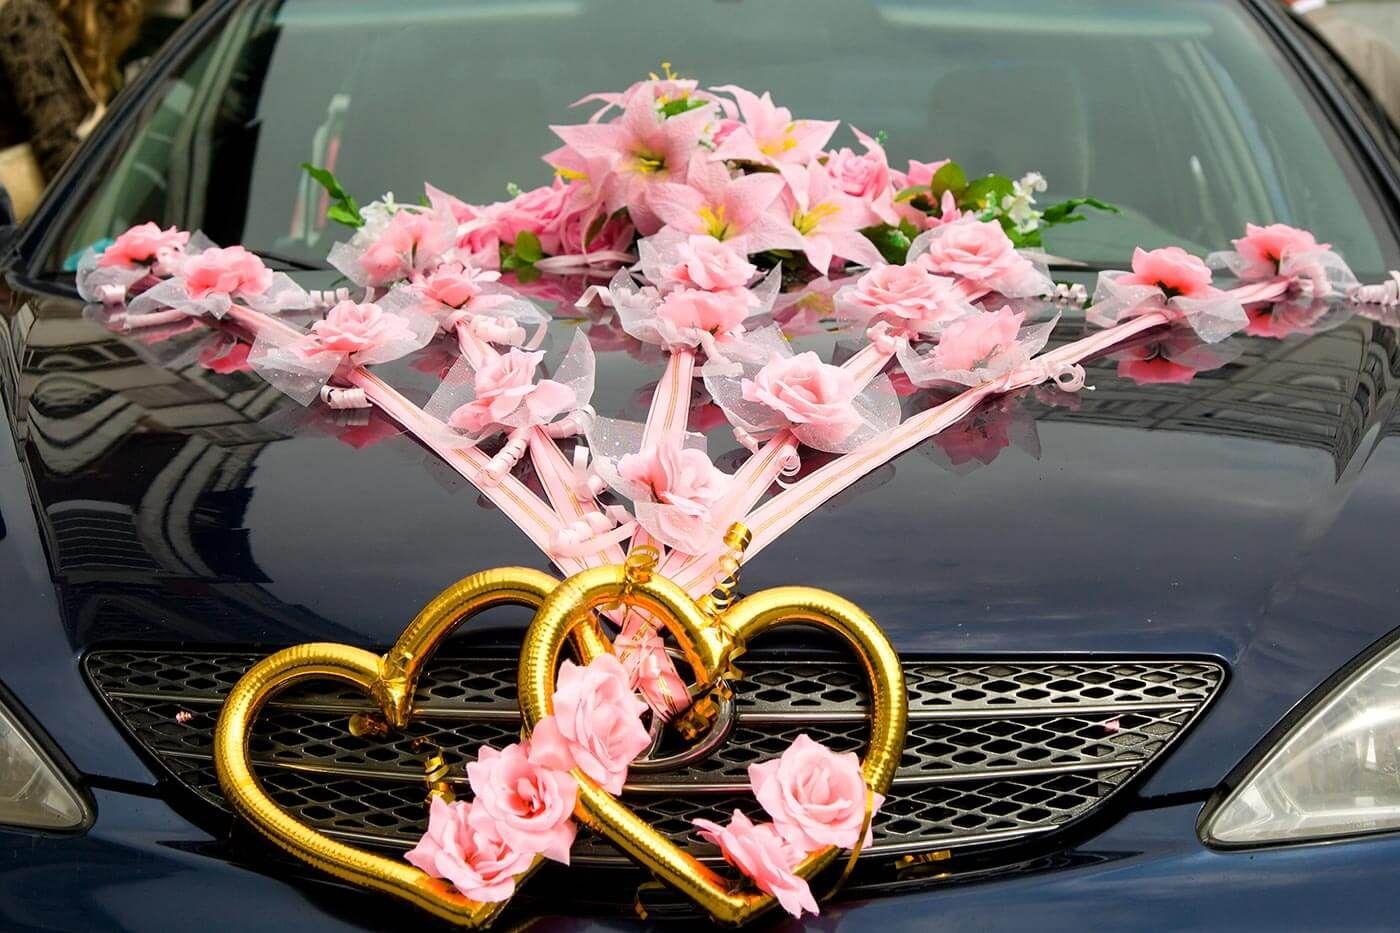 Autoschmuck zur Hochzeit  Autoschmuck zur Hochzeit in